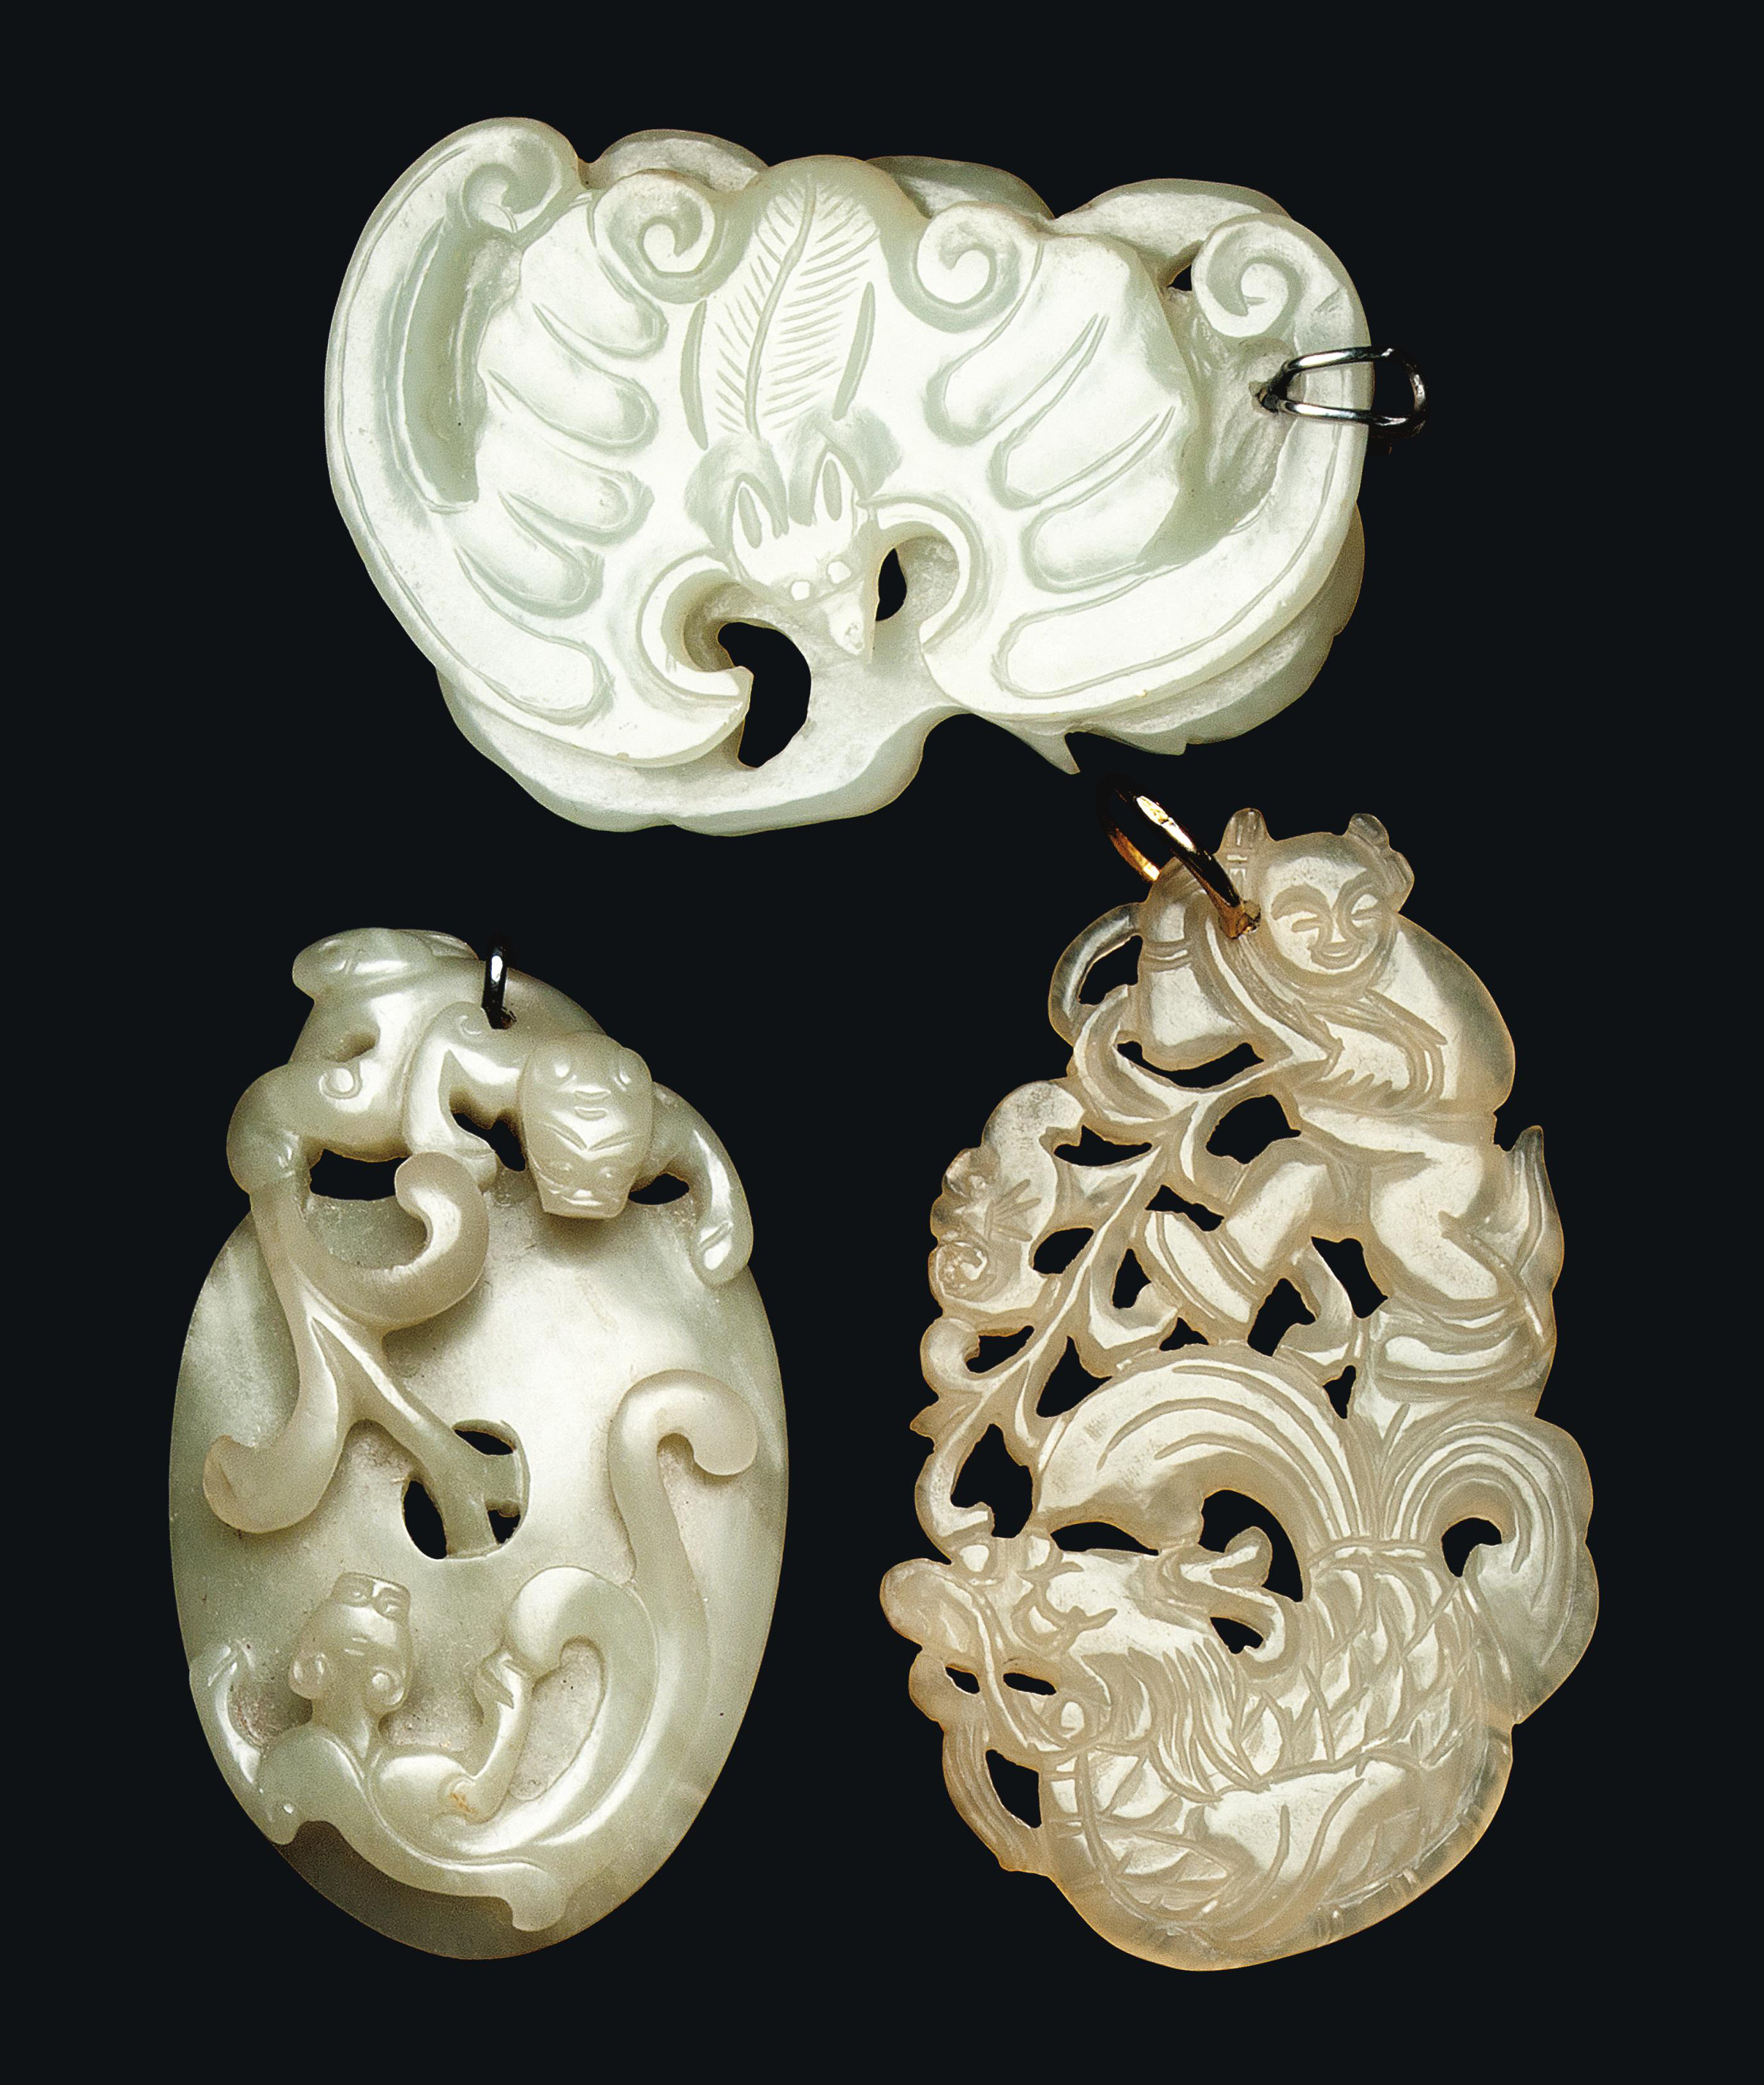 THREE CHINESE CELADON JADE PEN